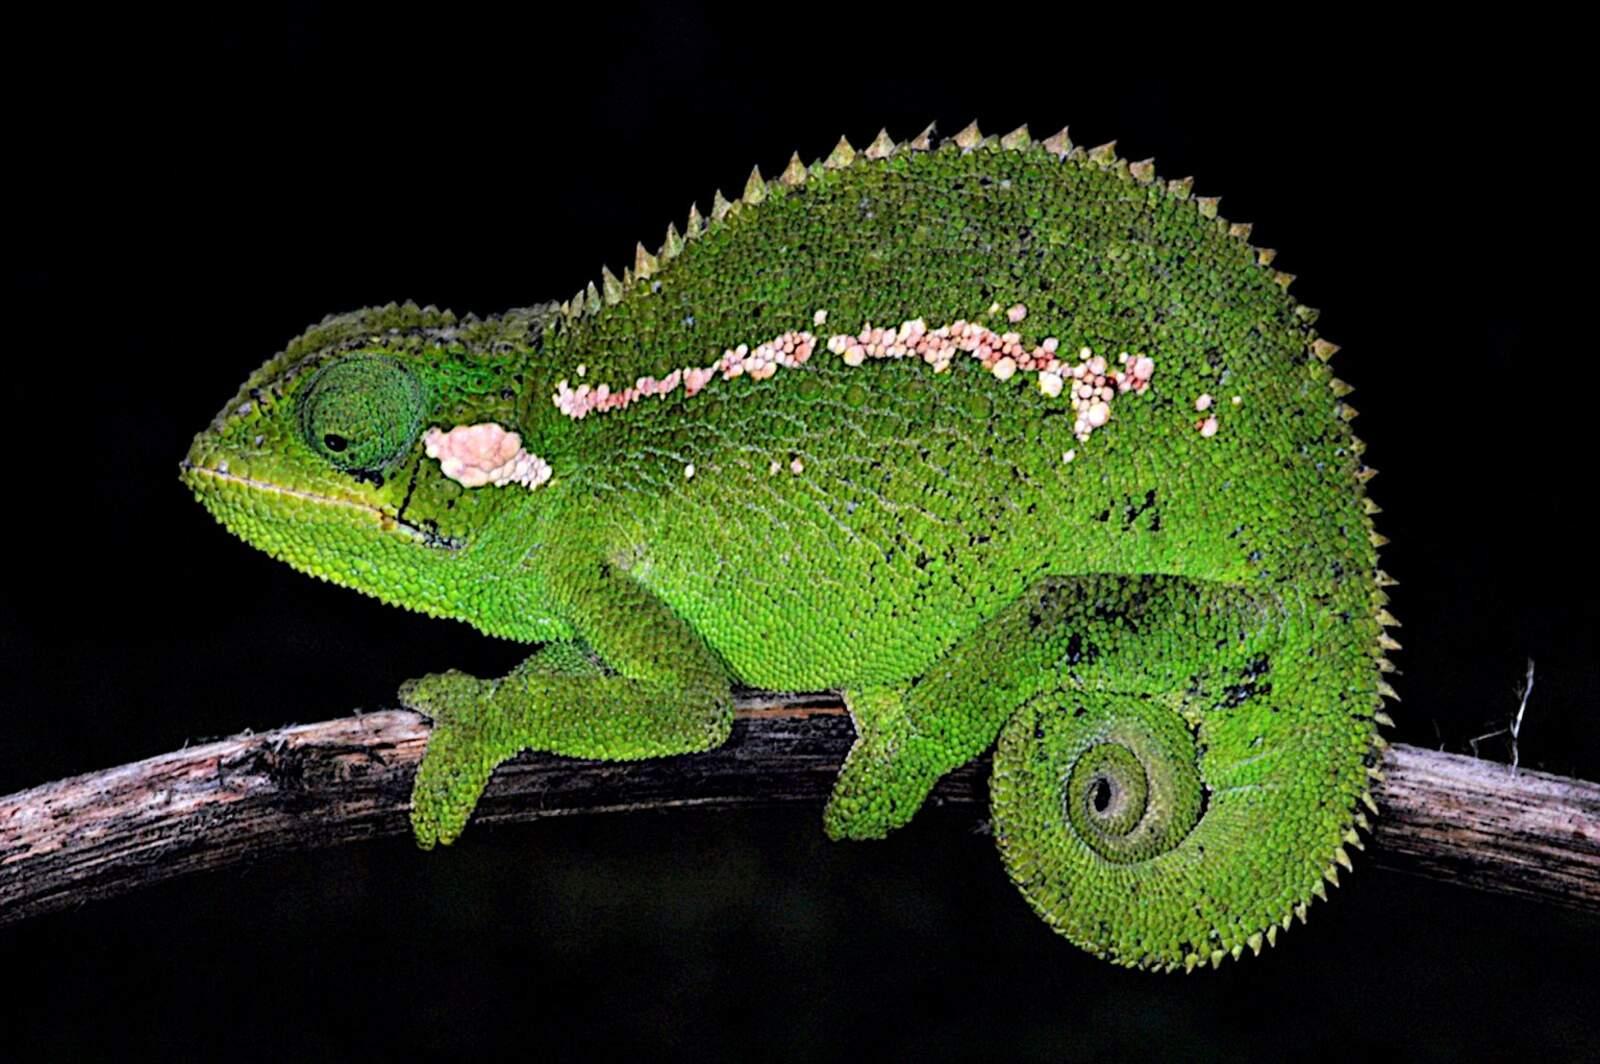 Trioceros wolfgangboehmei, el nou camaleó descobert a Etiopia